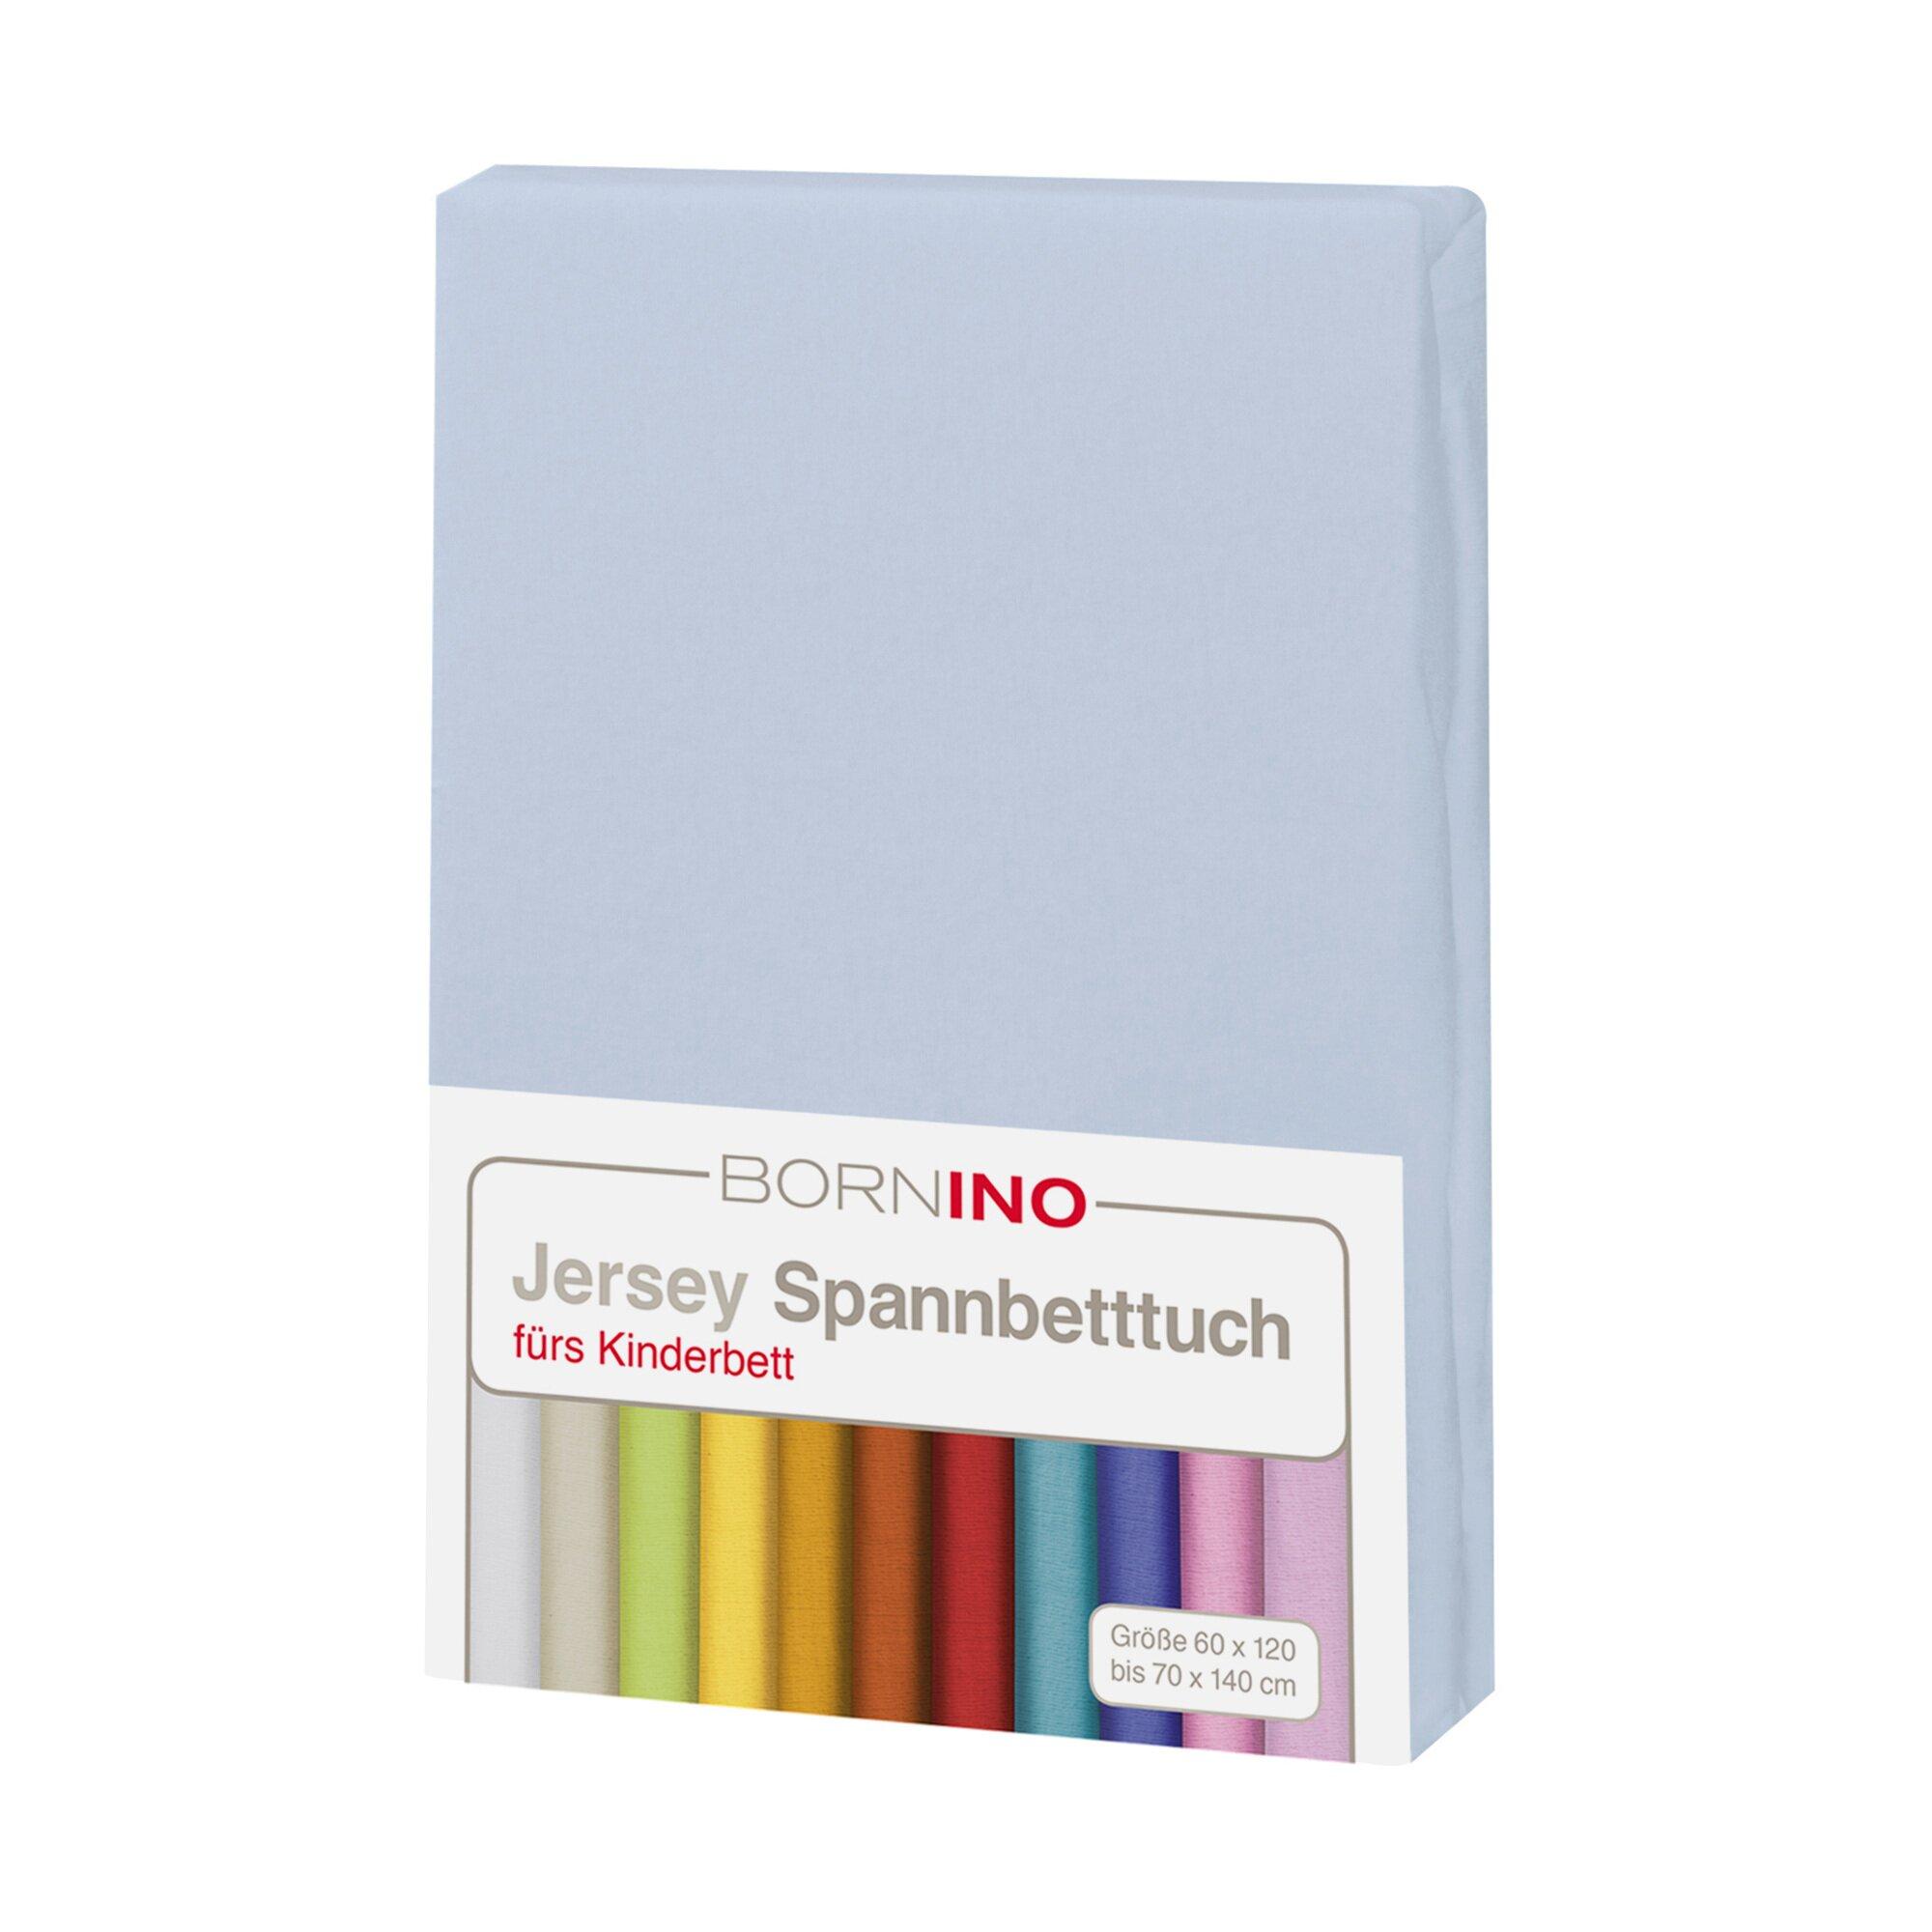 Bornino Home Jersey-Spannbetttuch 70x140 cm blau